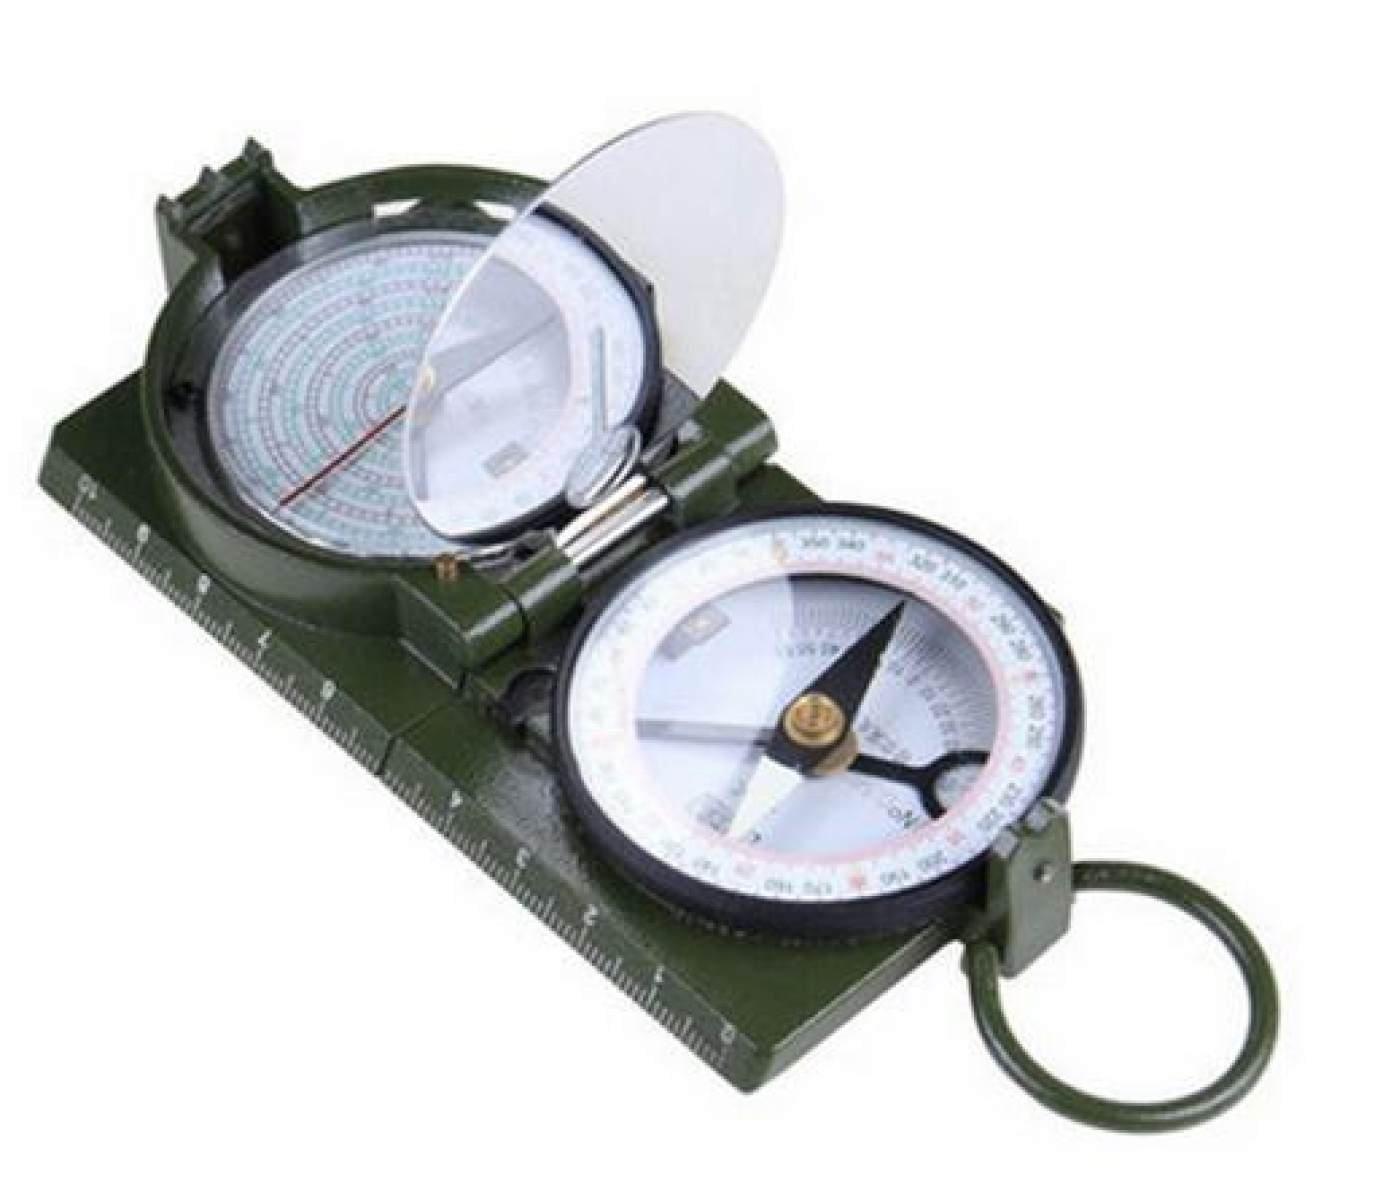 HWZNZ-HWSP Kompass Berg Camping Kompass Multifunktionales Kompass